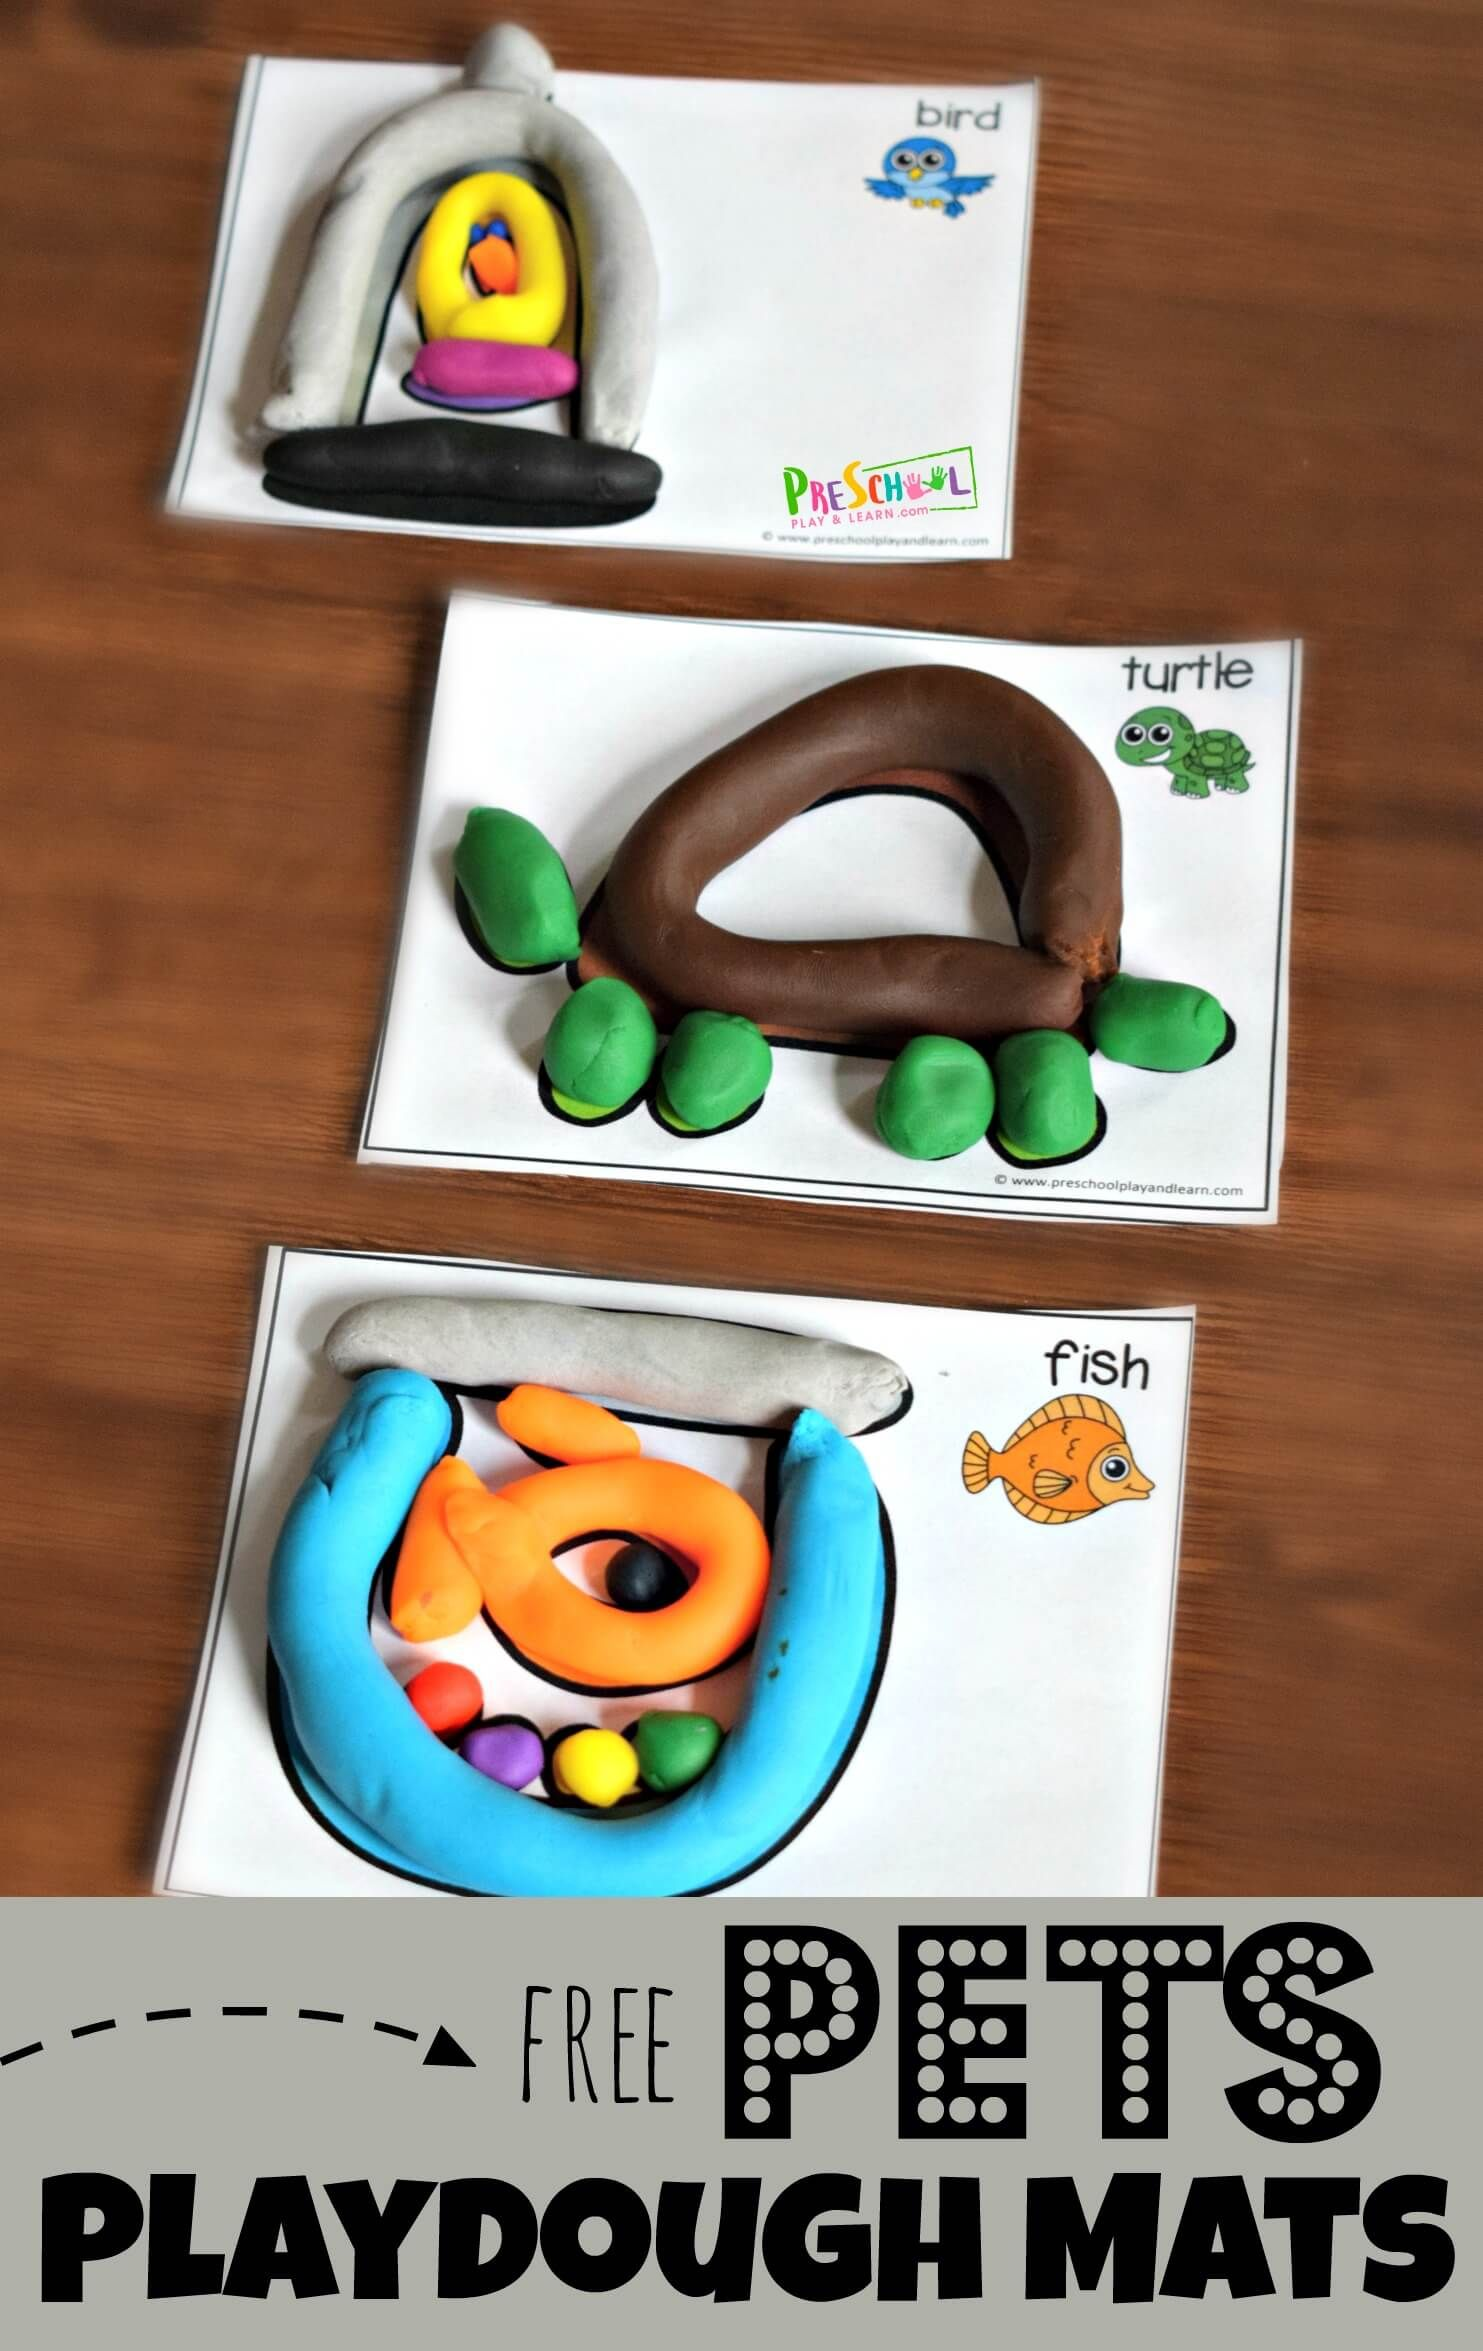 Free Pets Playdough Mats These Super Cute Preschool Printables Allow Kids To Strengthen Hands Have Pets Preschool Theme Pets Preschool Preschool Printables